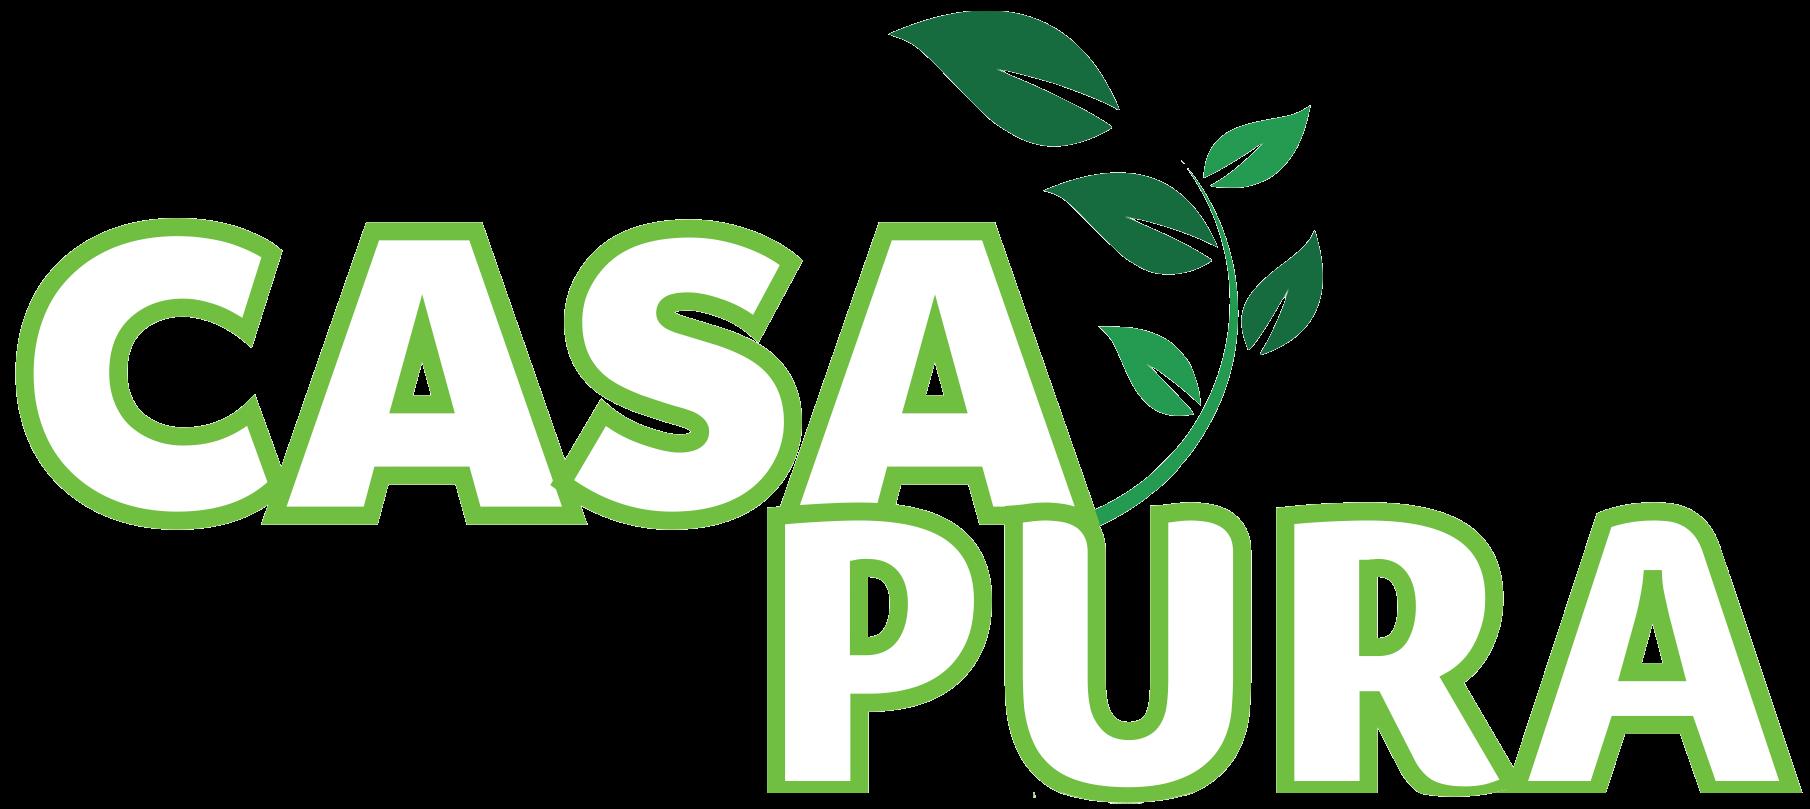 CASAPURA